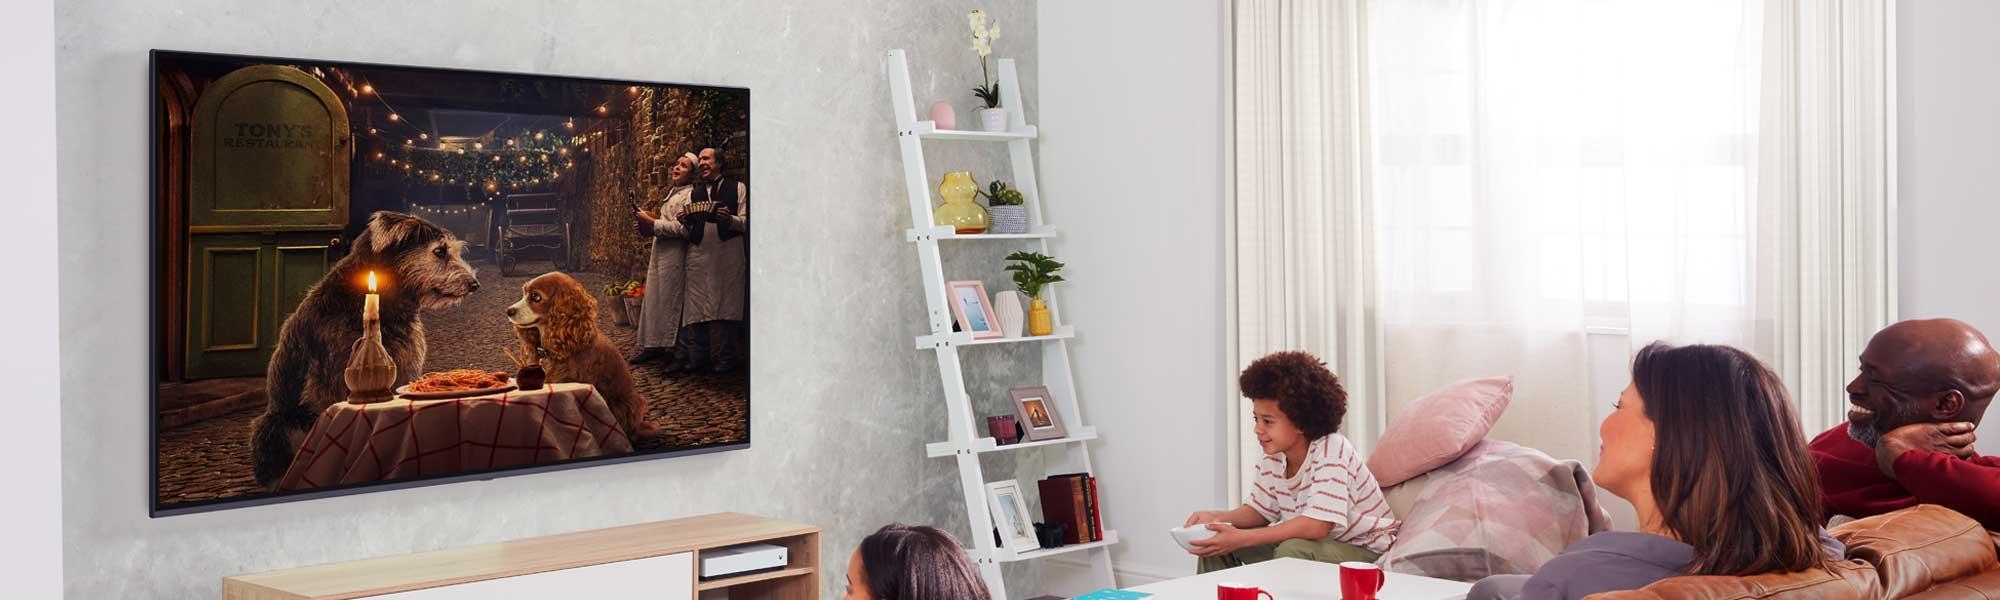 LG 65NANO956NA (2020) 65 inch NanoCell IPS HDR Full Array 8K TV